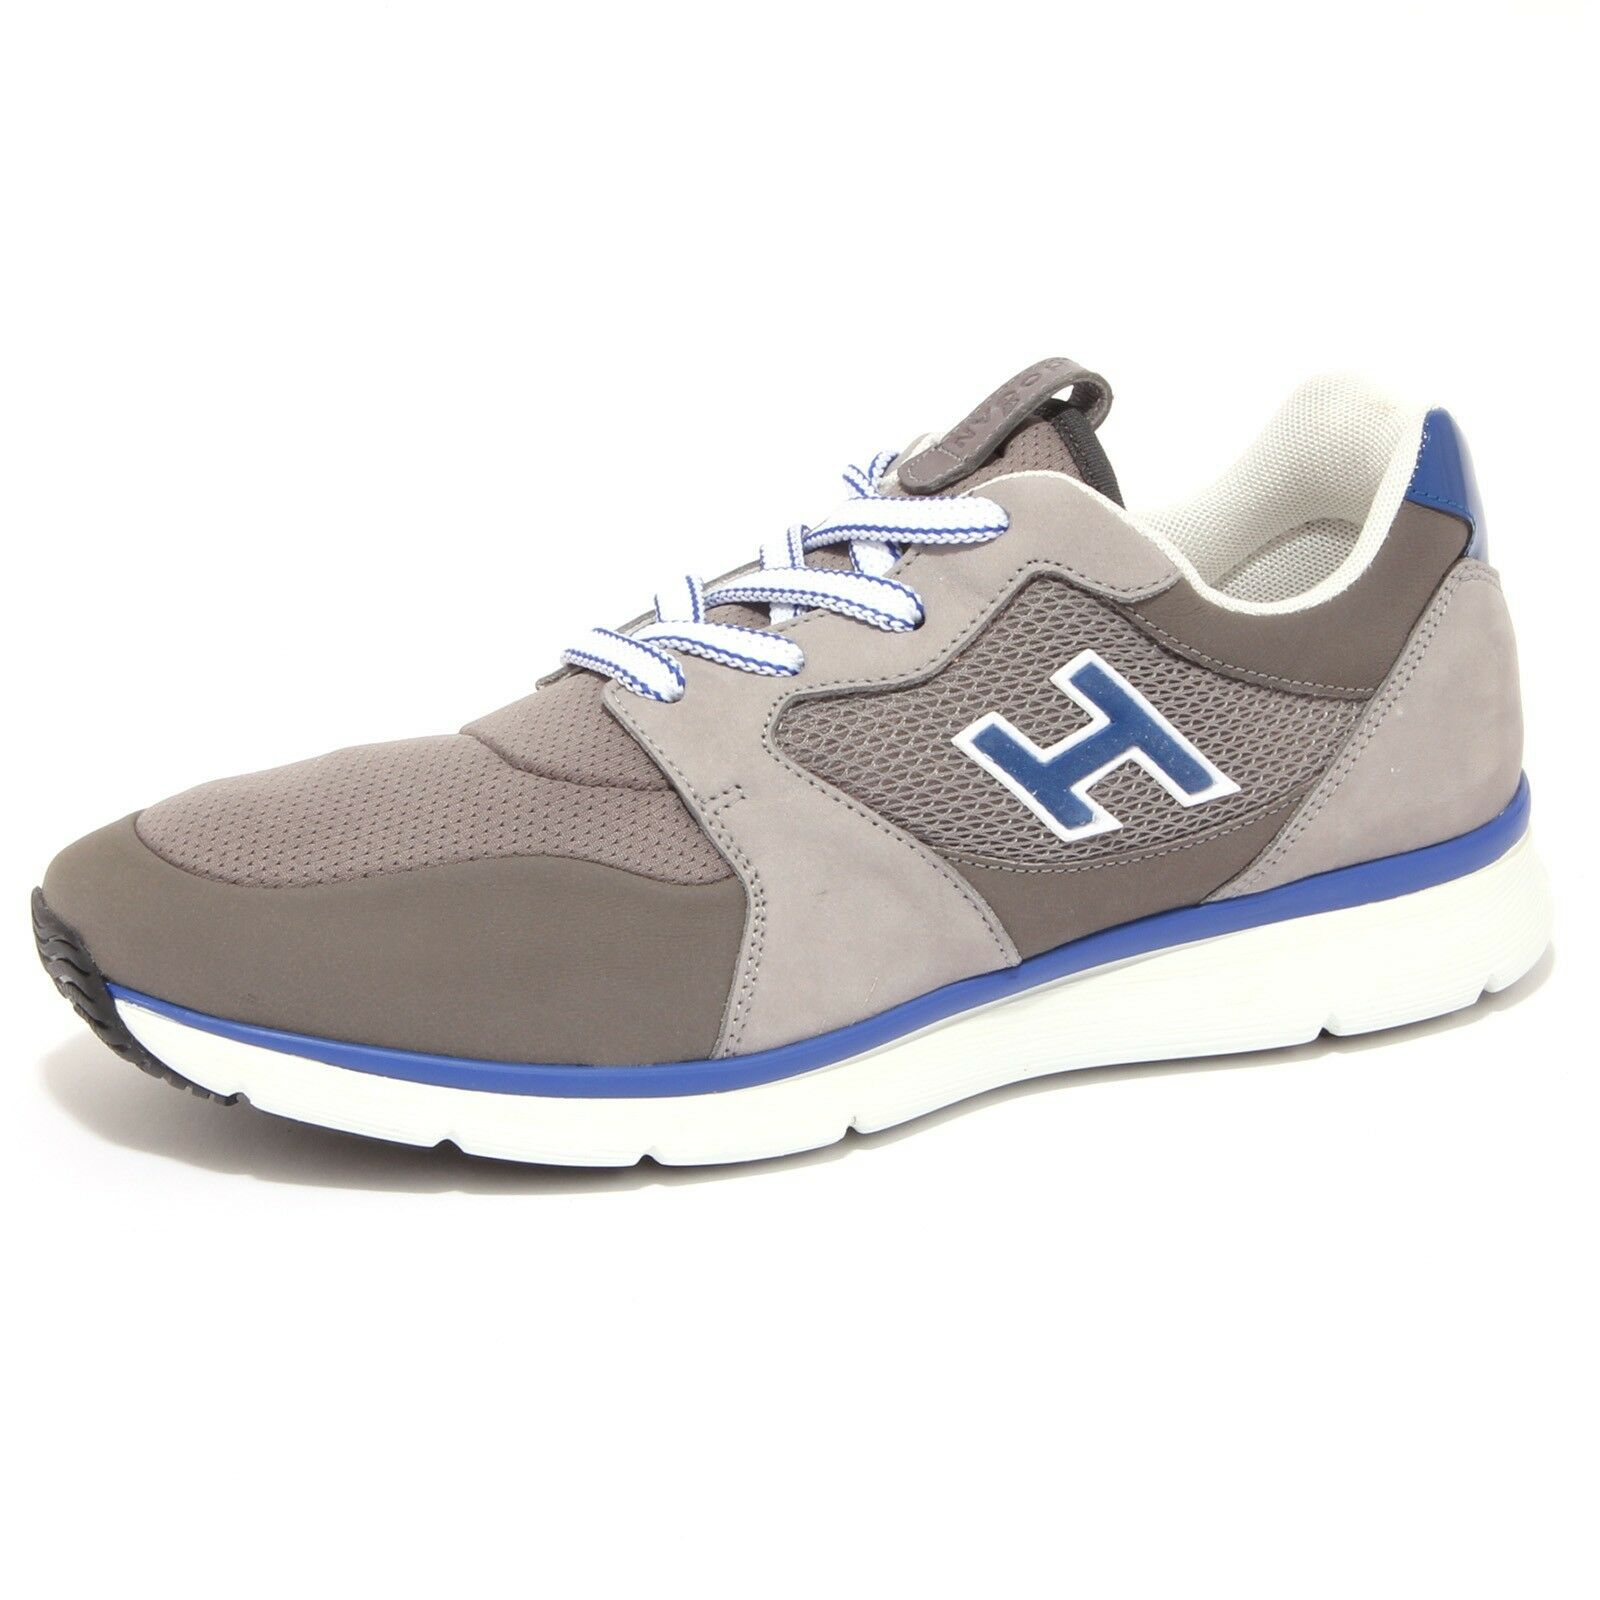 4205Q sneaker hombre HOGAN NEW SNEAKER H FLOCK Gris/blu Gris/blu Gris/blu Gris Zapatos  Hombre 377323